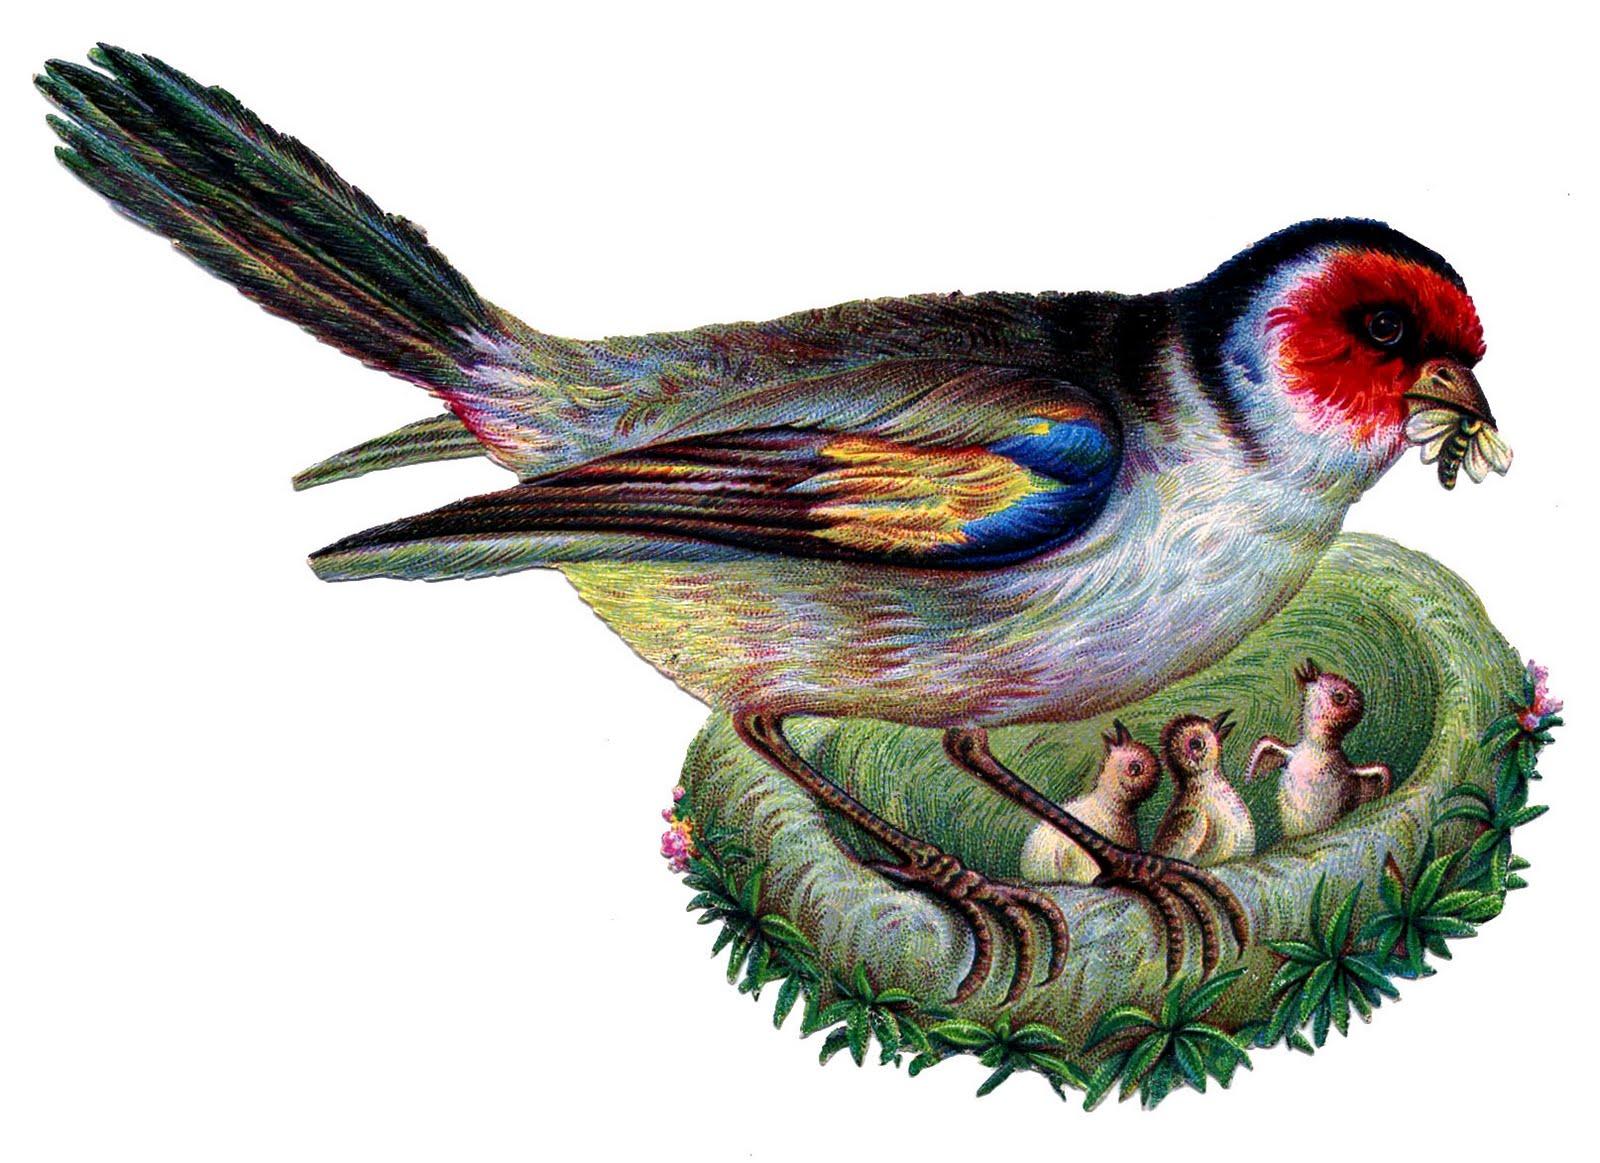 http://thegraphicsfairy.com/wp-content/uploads/blogger/-OAvk0IJ_GvQ/TYPt8IEWWyI/AAAAAAAALVo/Vz5KZ-2O4Ew/s1600/bird-nest-vintage-image--graphicsfairy003b.jpg